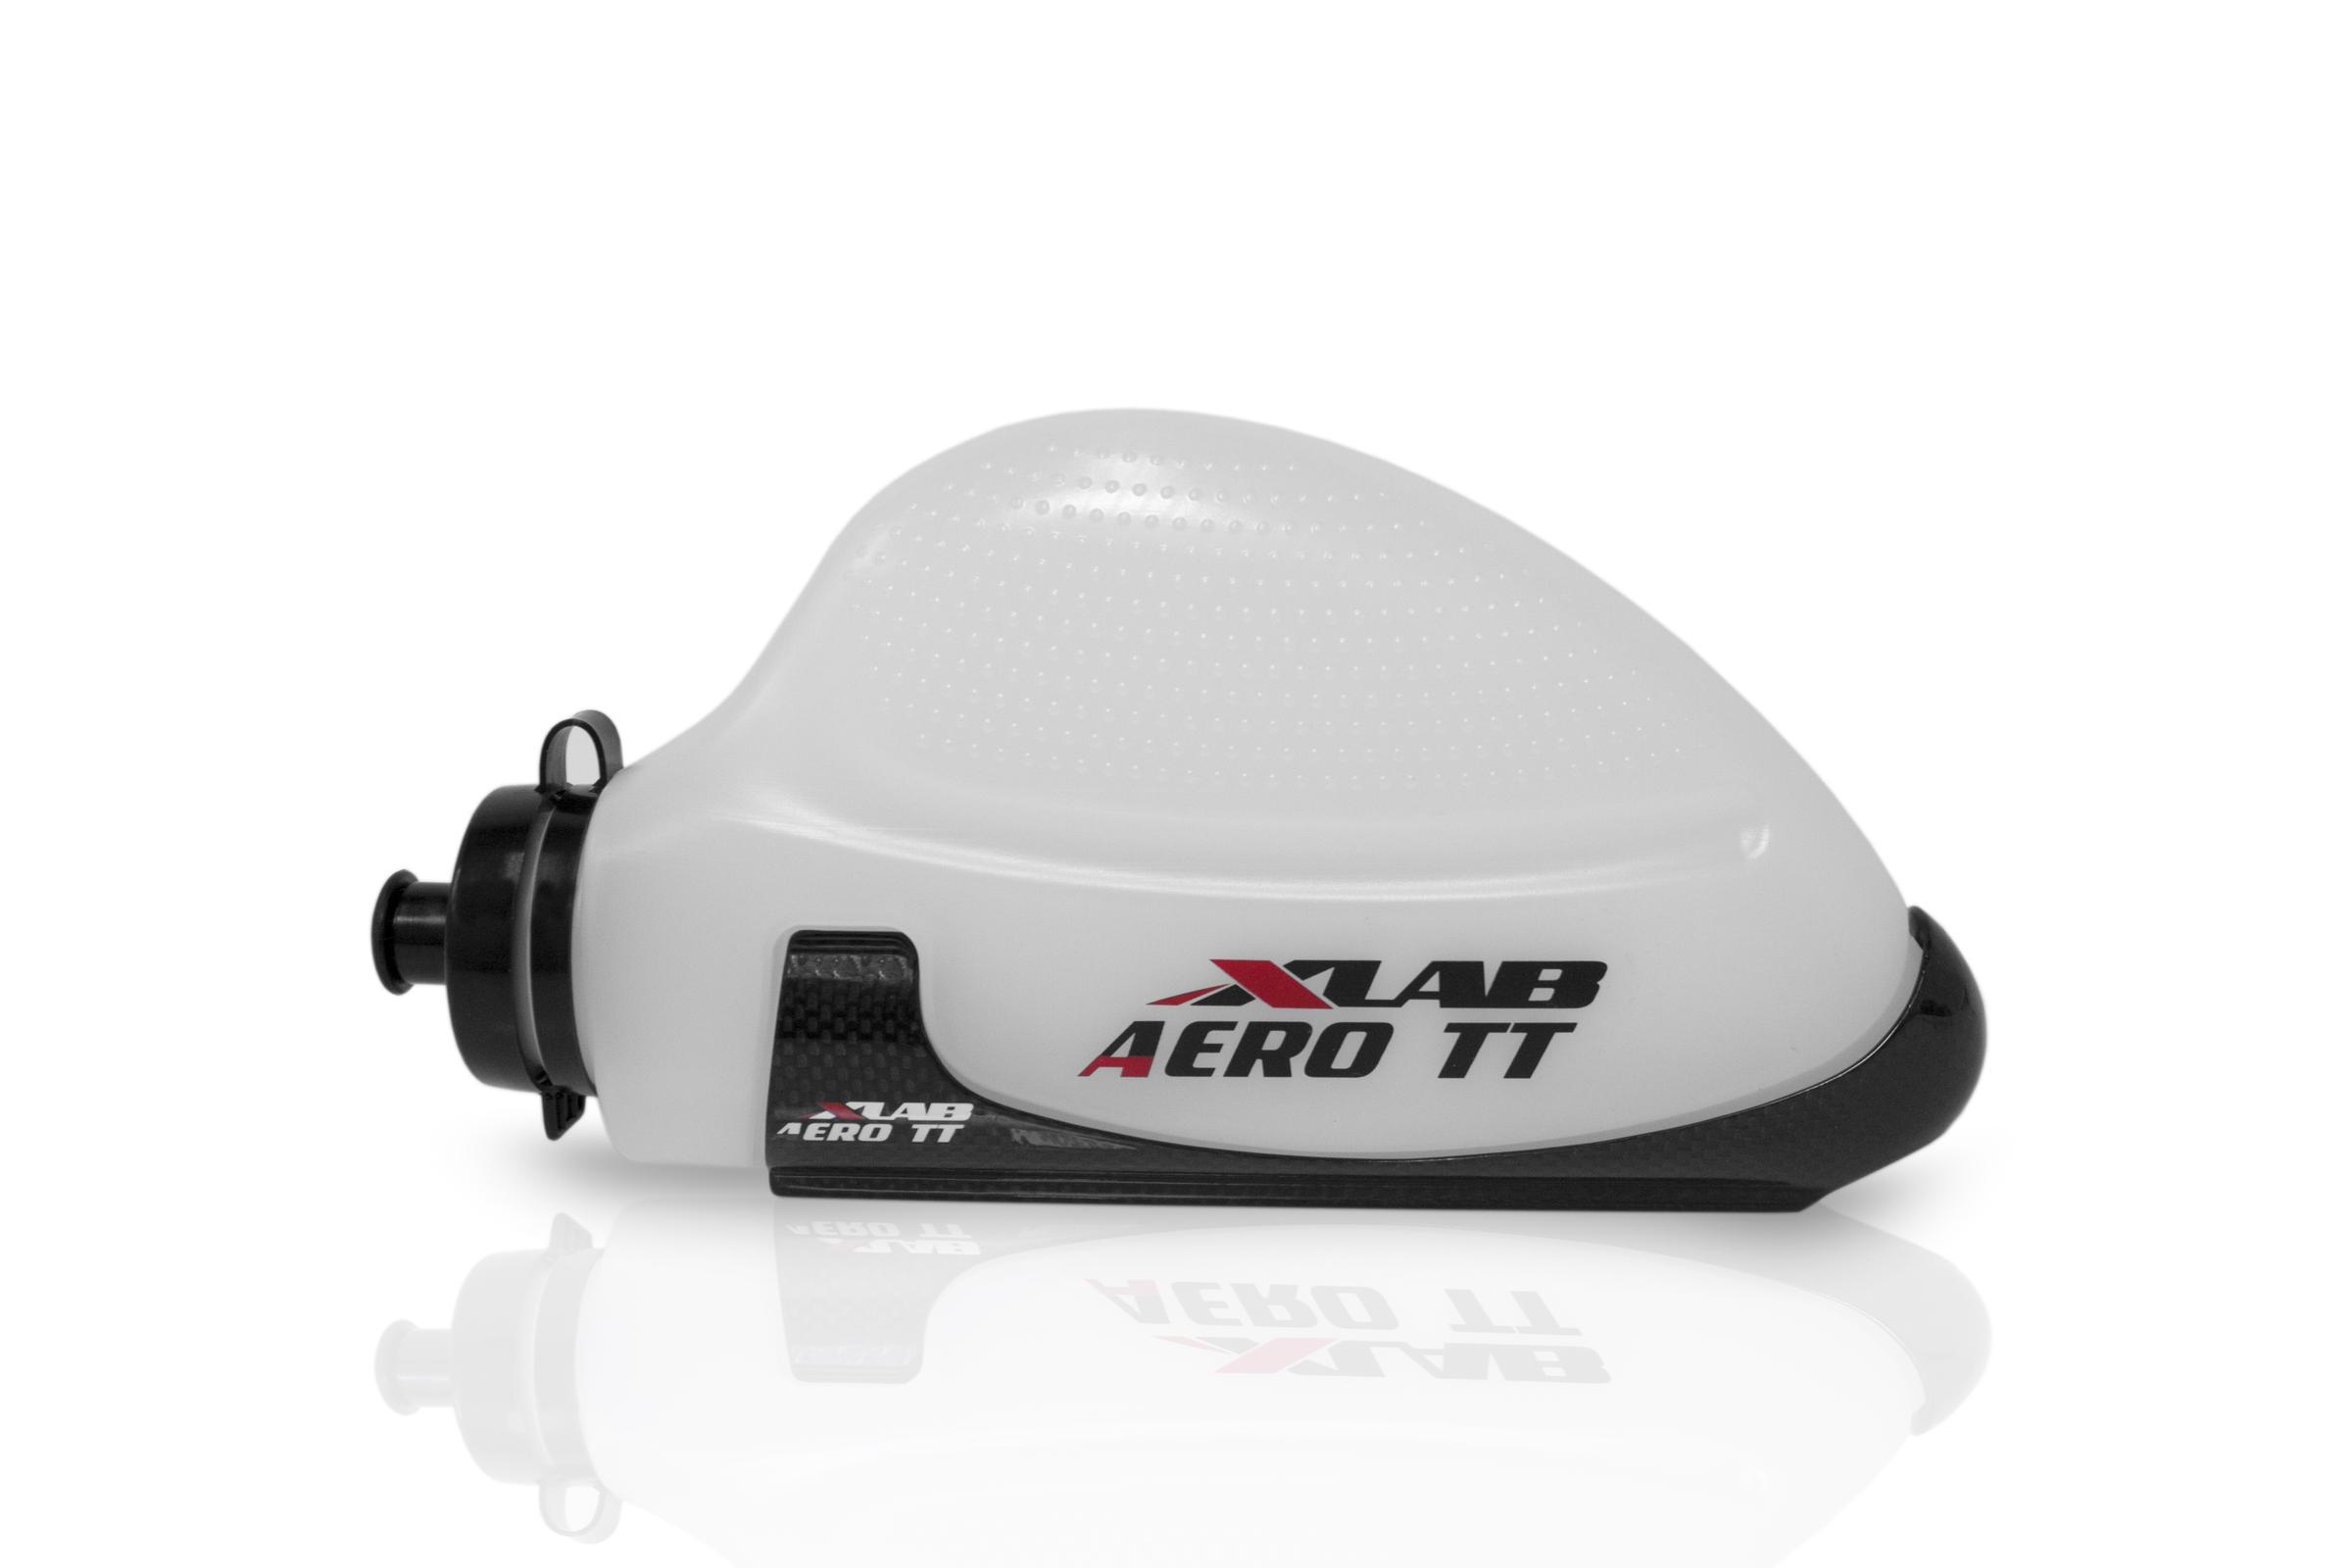 X-Lab Aero TT Black xlab